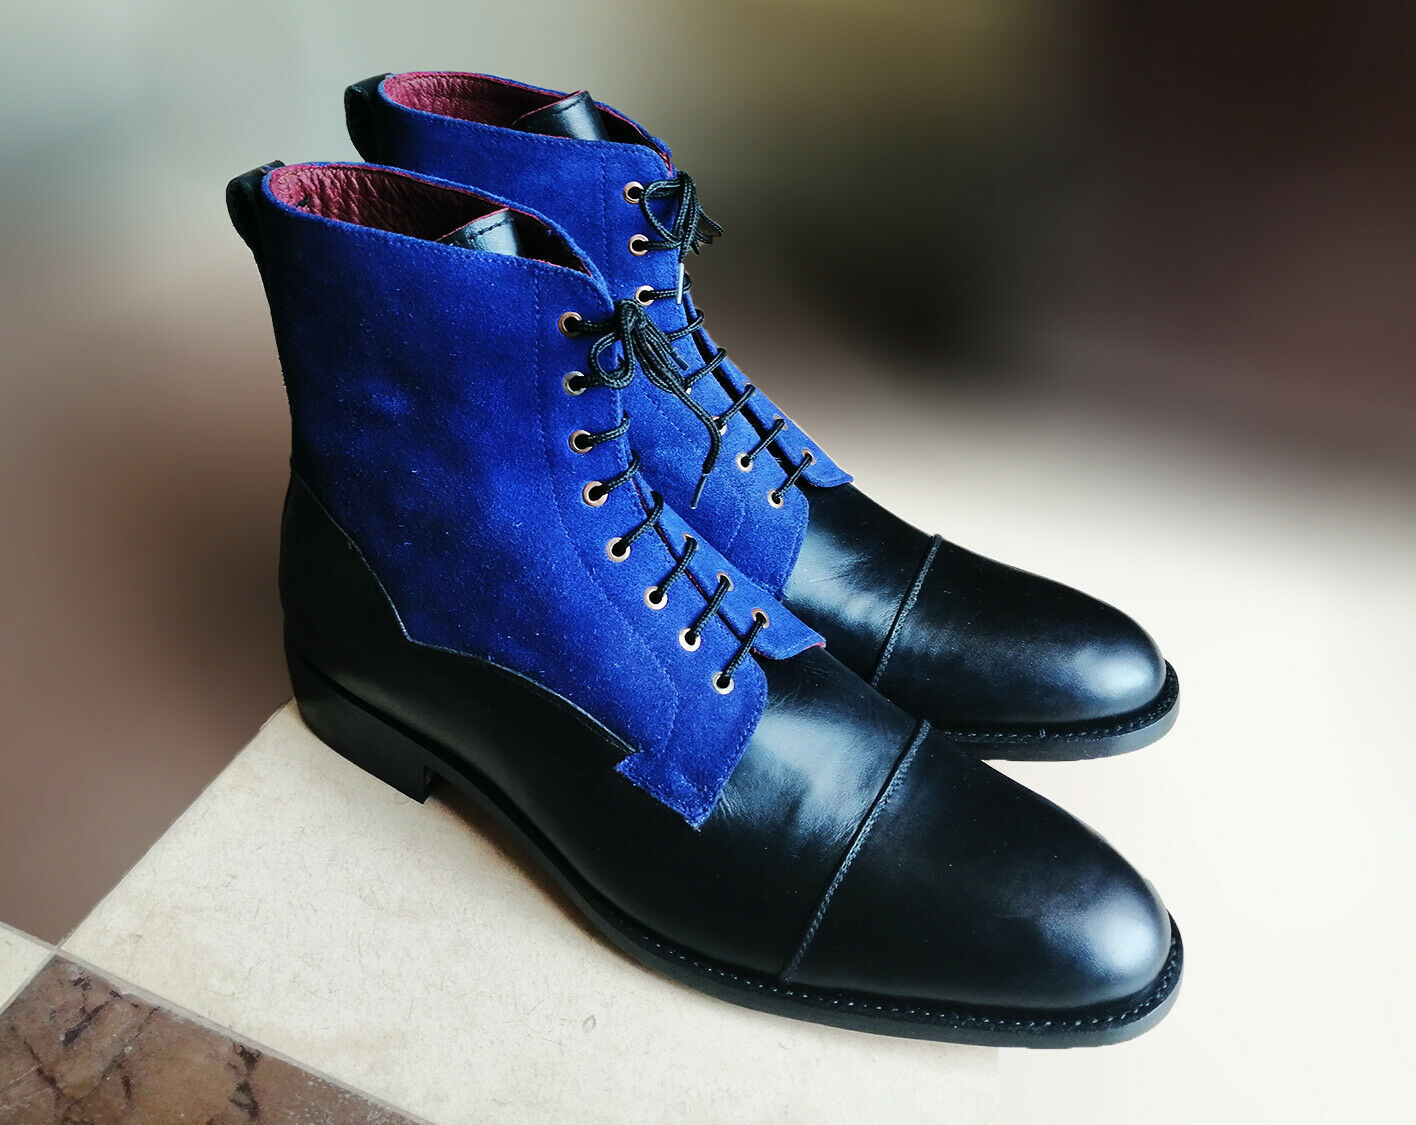 Genuine Premium Black Blue Two Tone Leather High Ankle Men Lace Up Cap Toe Boots